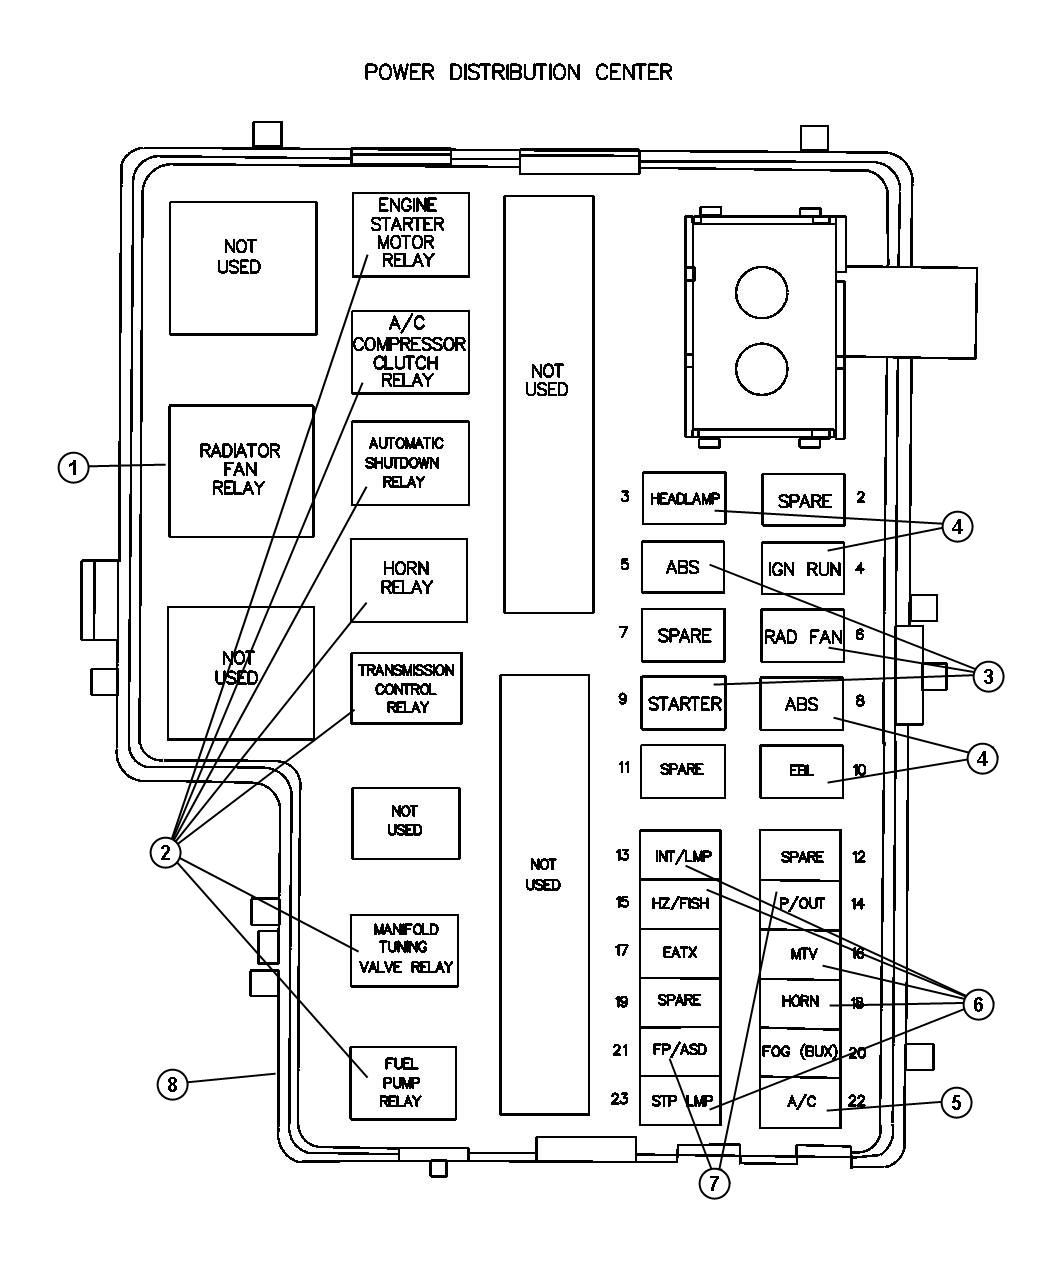 Schematic Of A 2002 Duramax Sel Engine also Gluehstartschalter 034231500x 1 furthermore International Dt466e Engine Diagram in addition 7 3 Powerstroke Engine Wiring Diagram as well Idi. on 6 0 glow plug wiring diagram